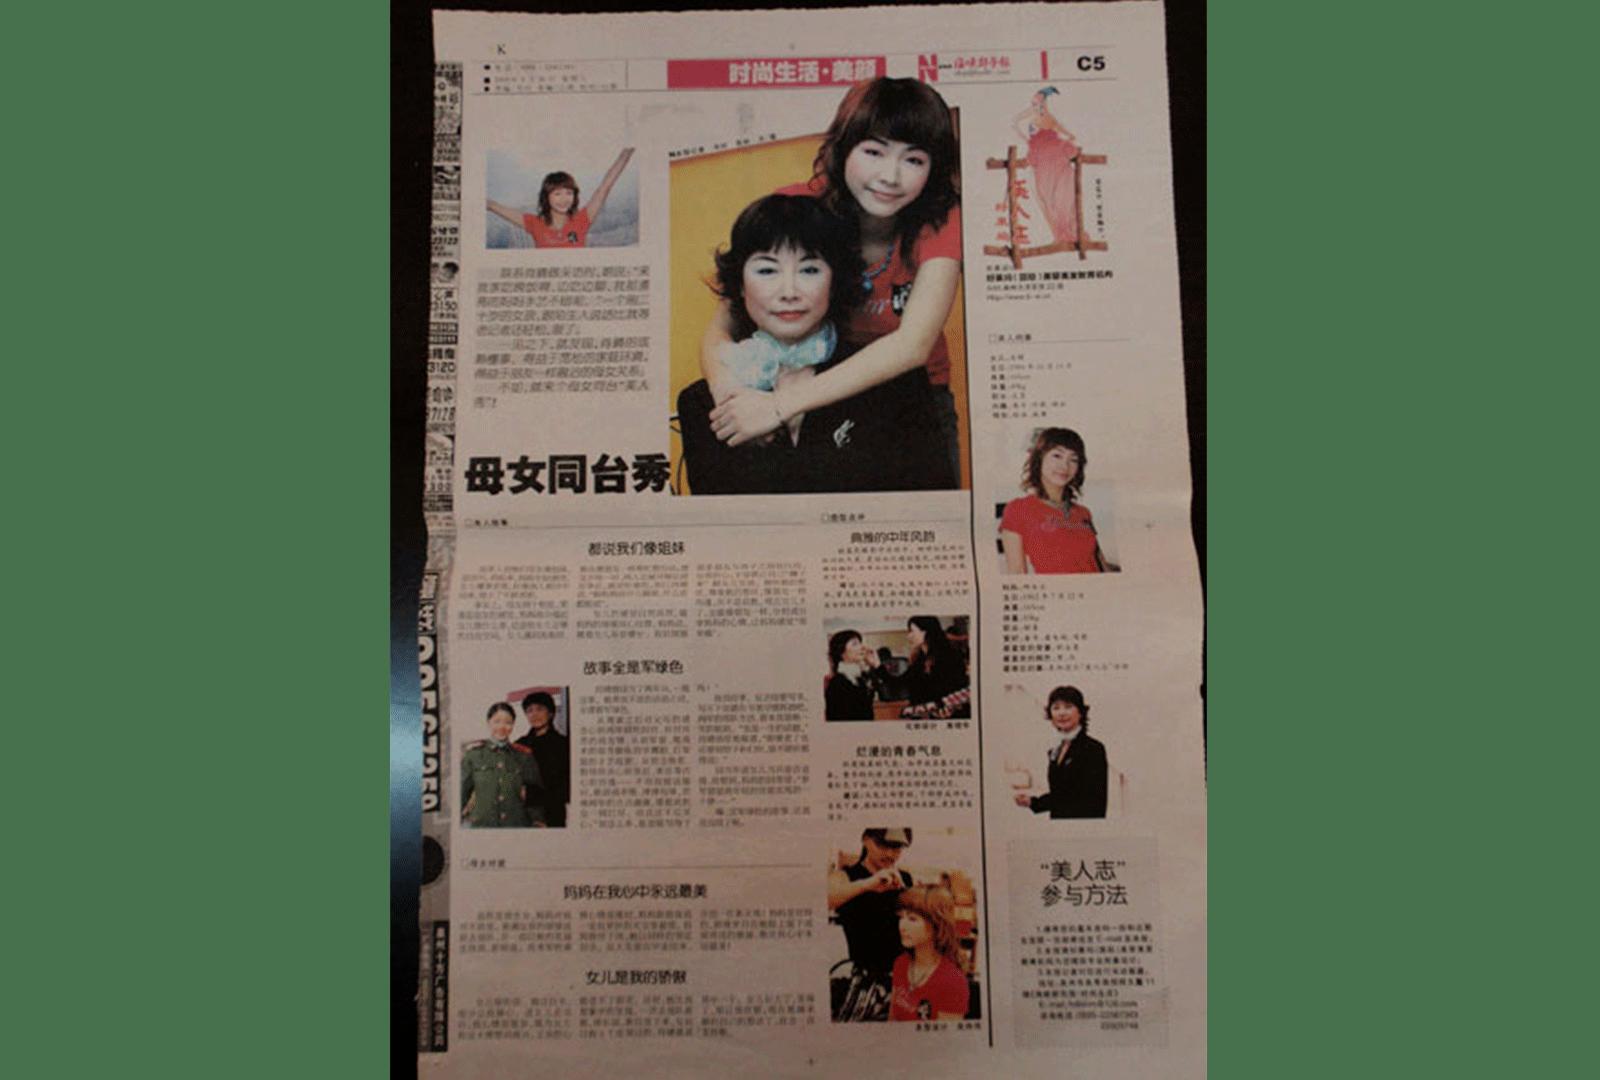 _0000s_0014_海峡都市报-2005-3-26-时尚生活·美颜